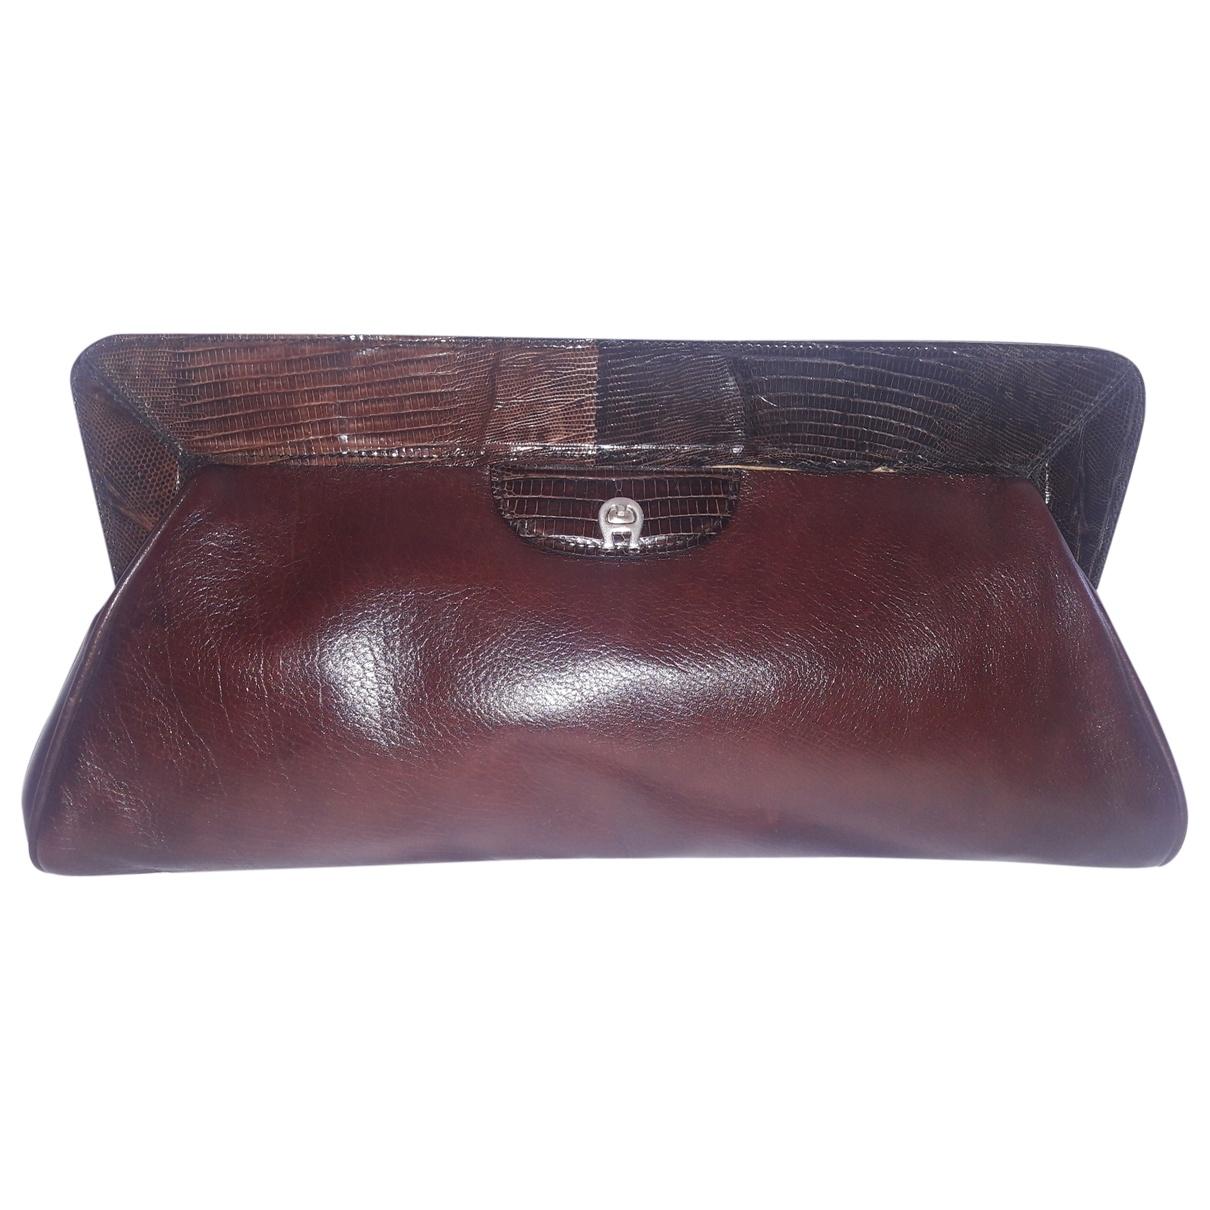 Etienne Aigner \N Brown Leather Clutch bag for Women \N